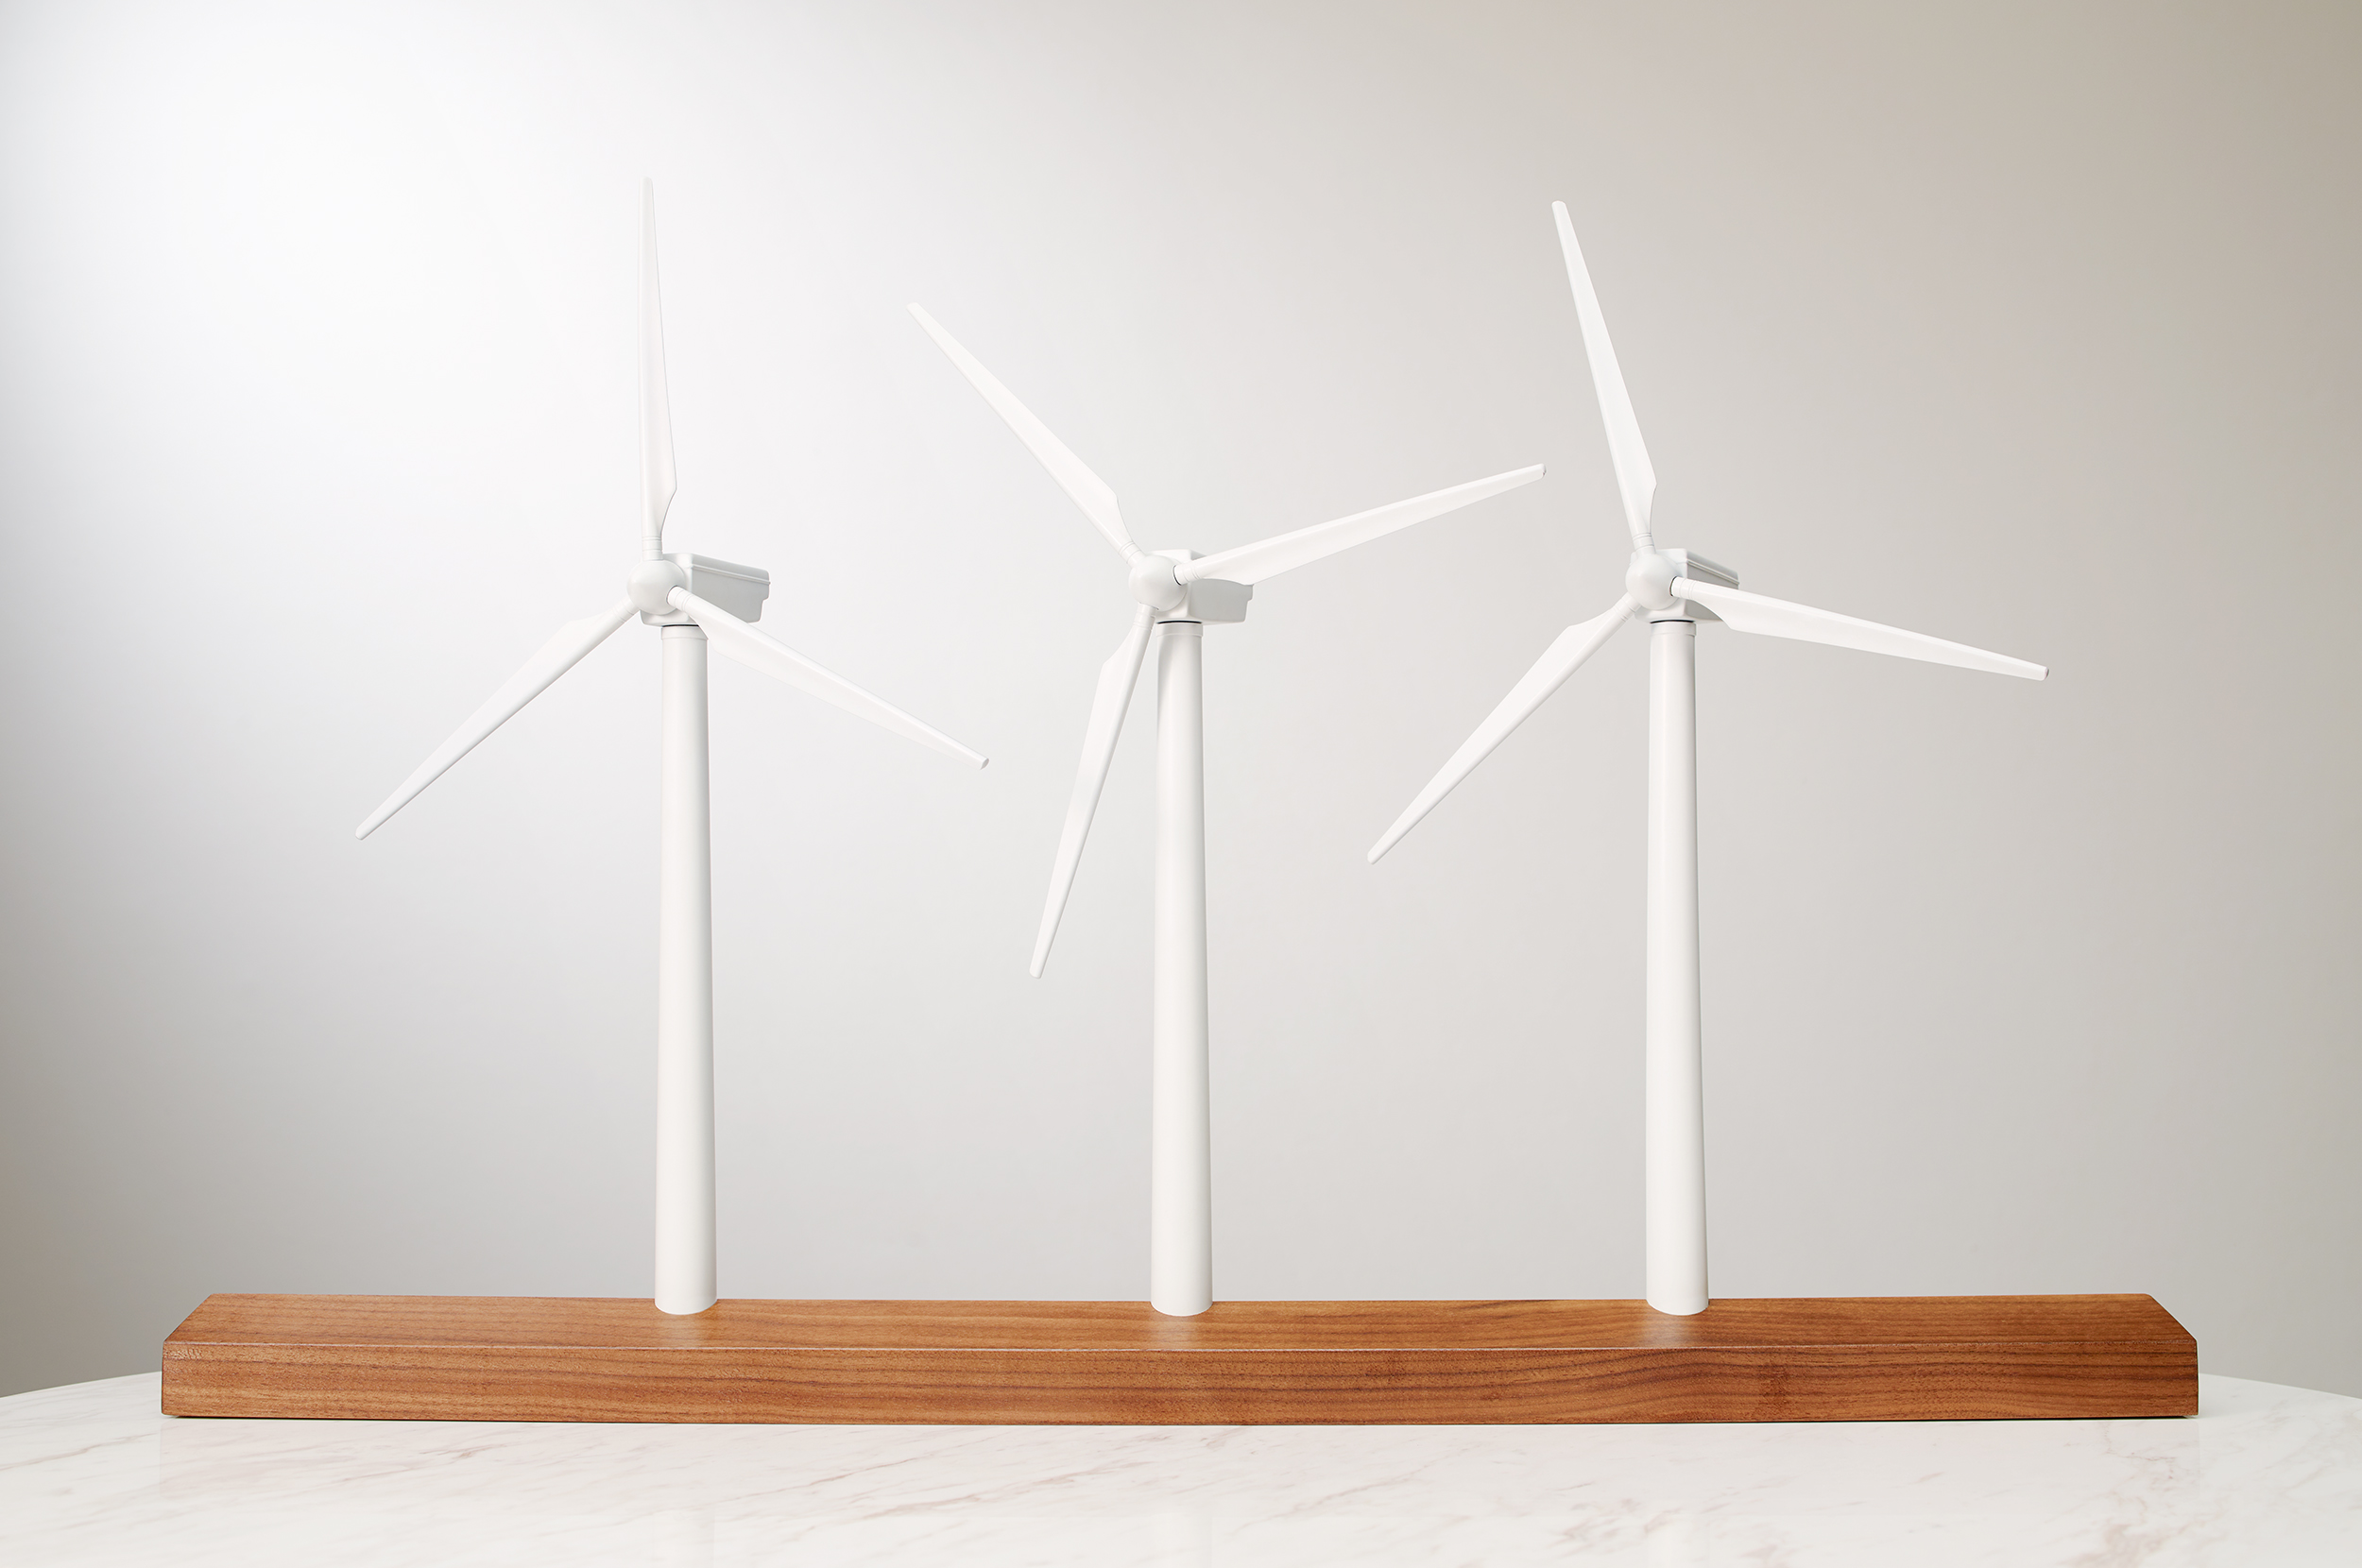 _170106 Post and Gleam table top Windmills COMP R1 FLLR.jpg